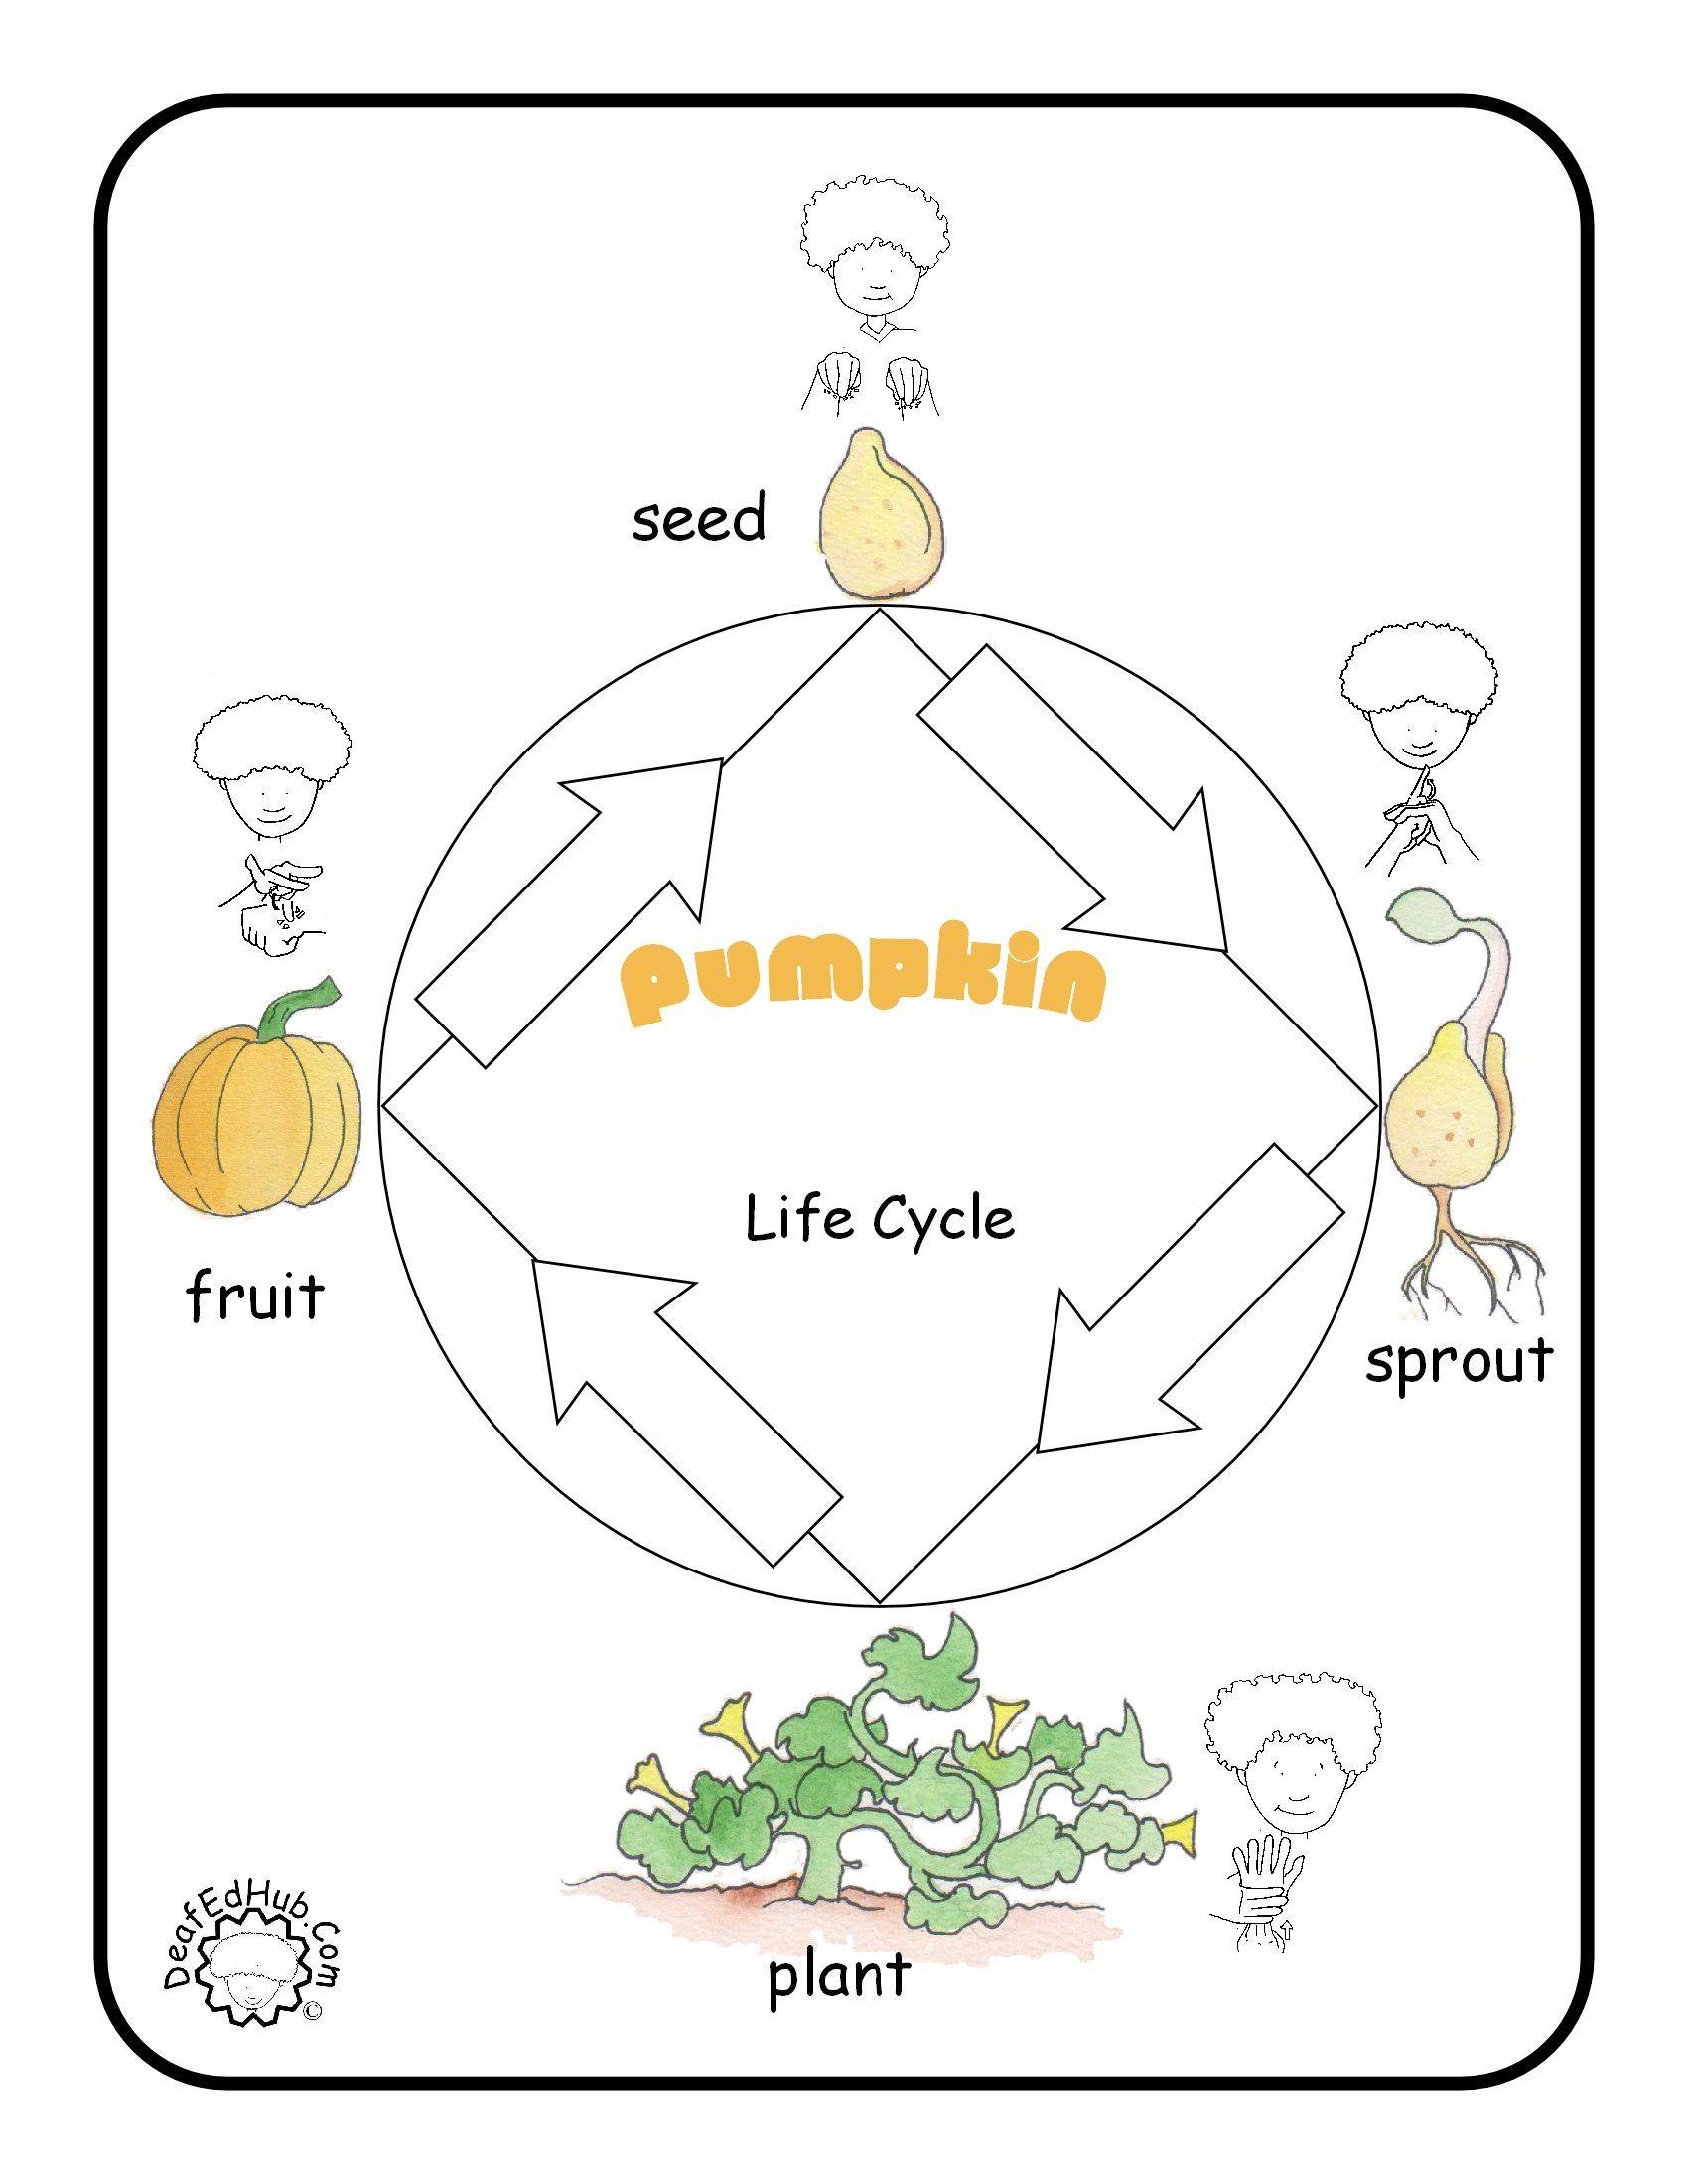 Free Worksheet Life Cycle Of A Pumpkin Worksheet pumpkin life cycle worksheet workbook site free worksheets